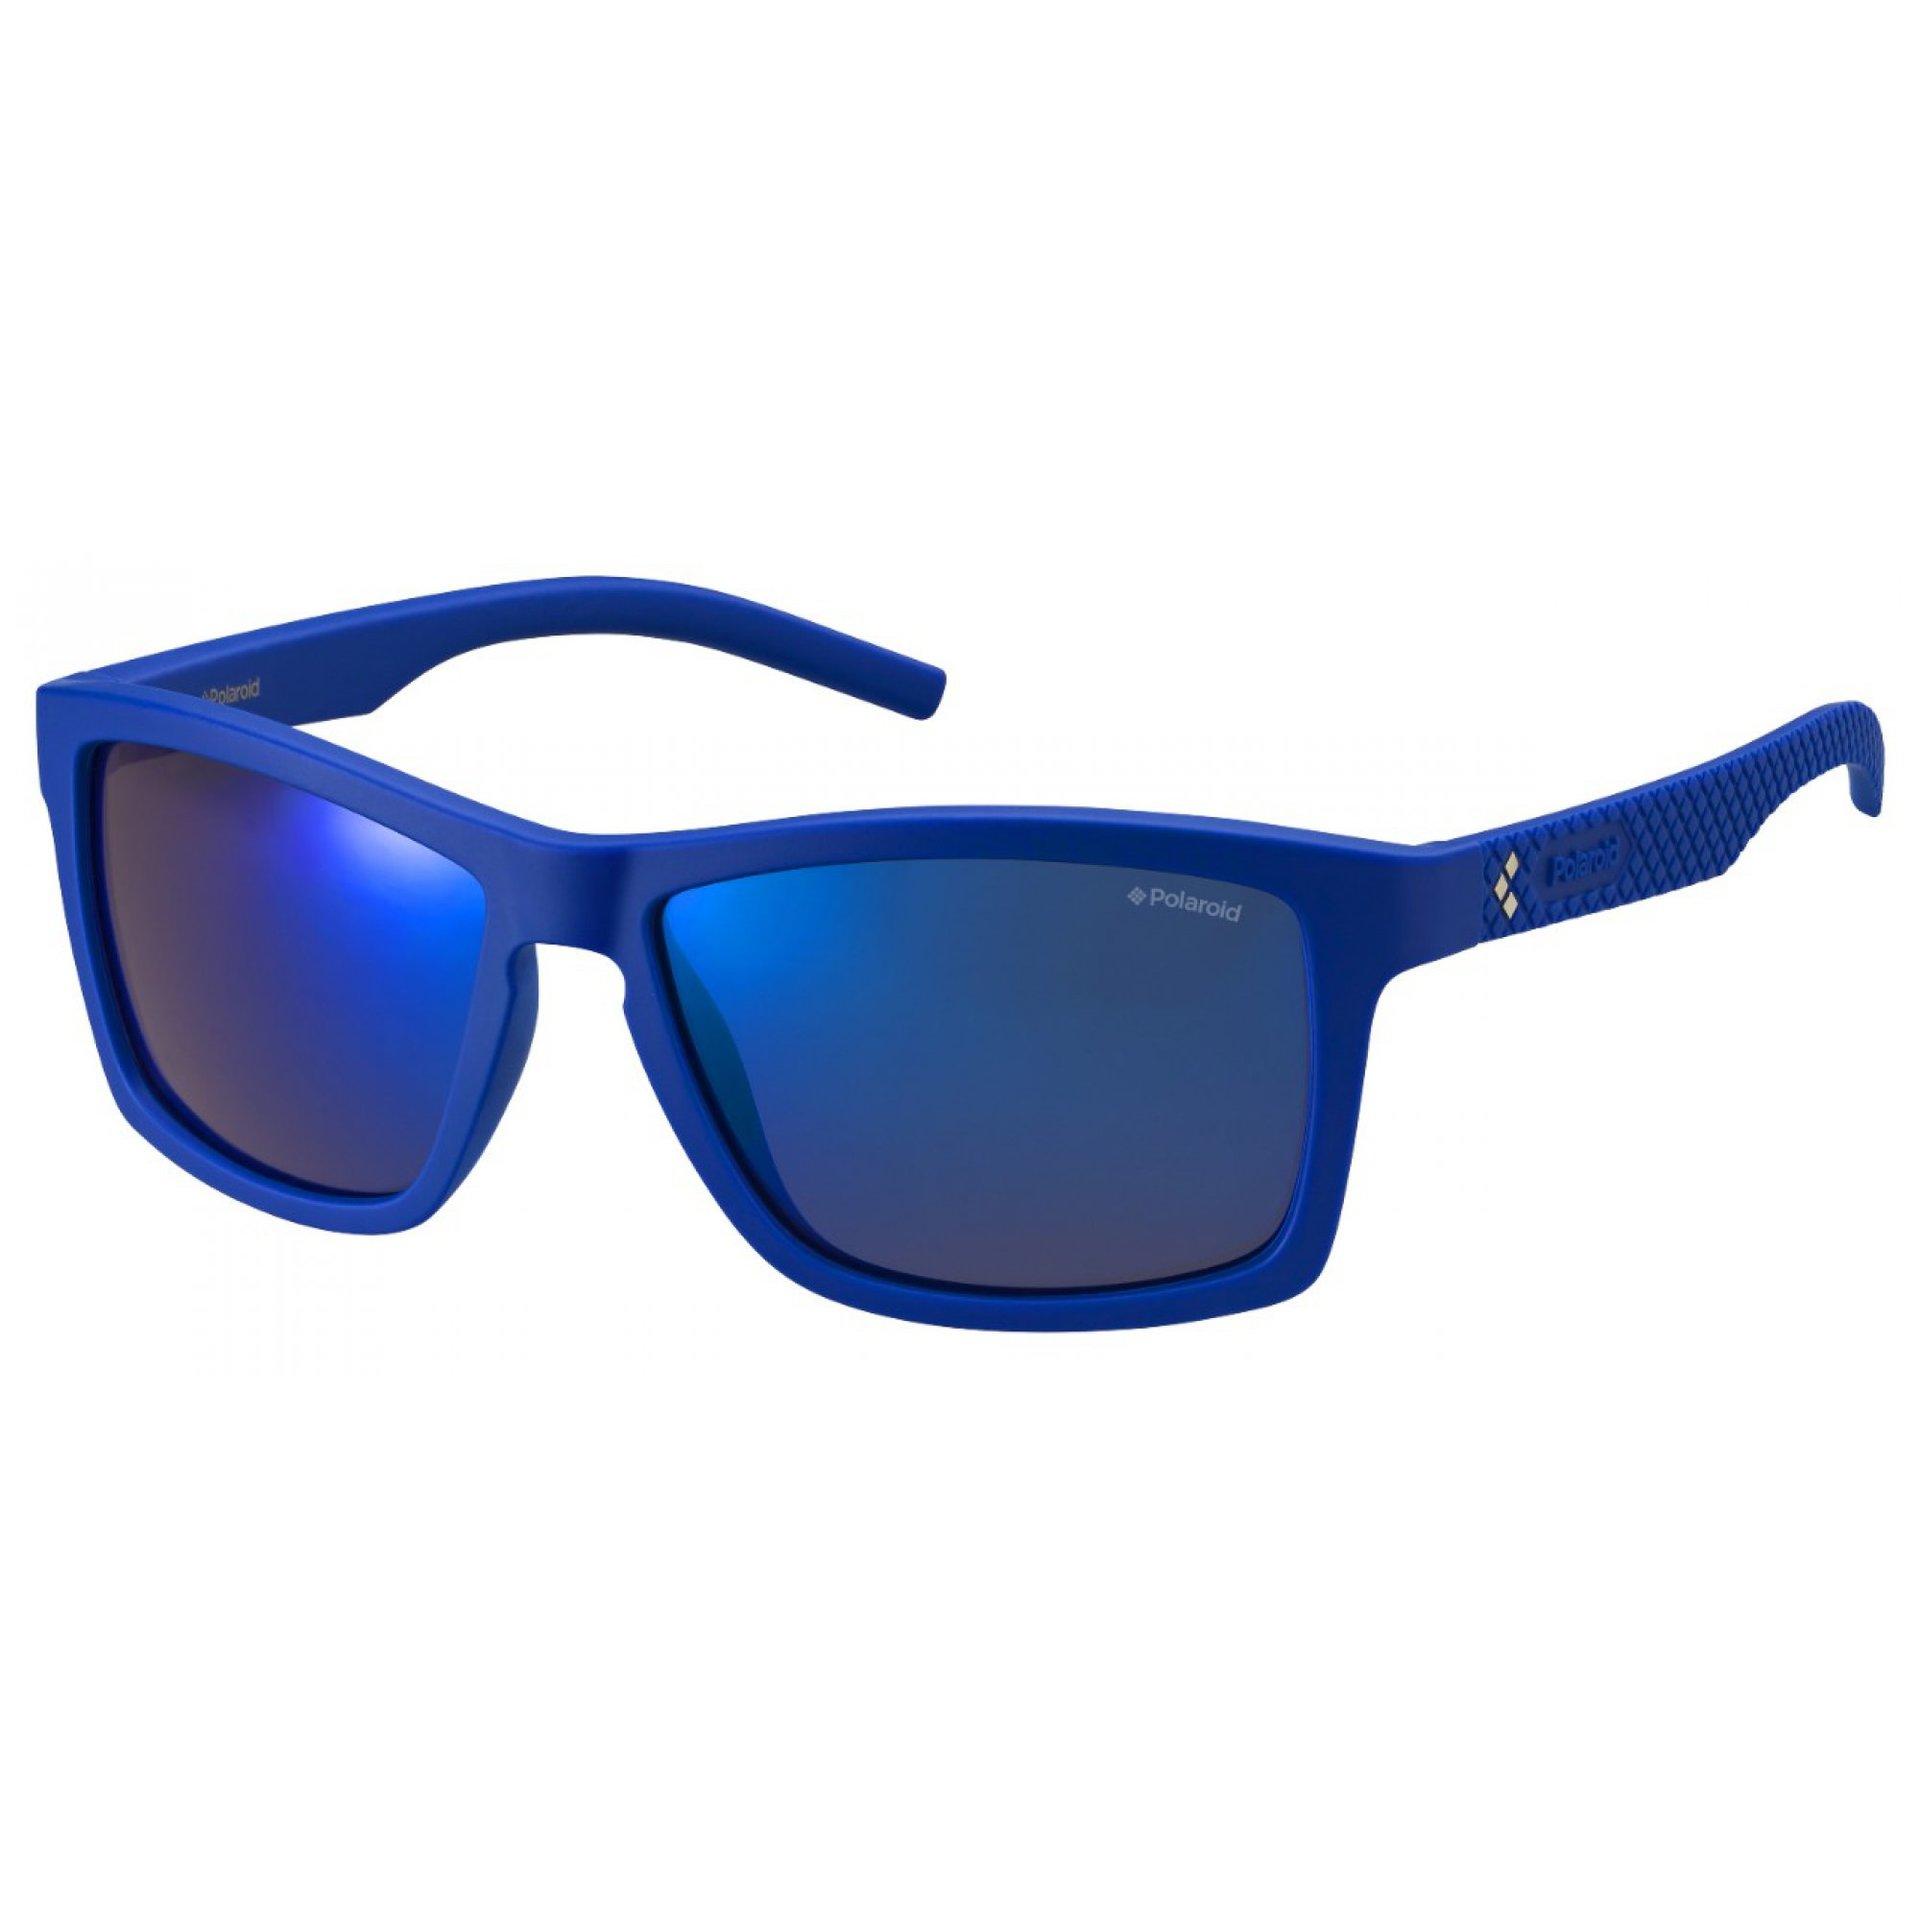 OKULARY POLAROID PLD 7009 N BLUE